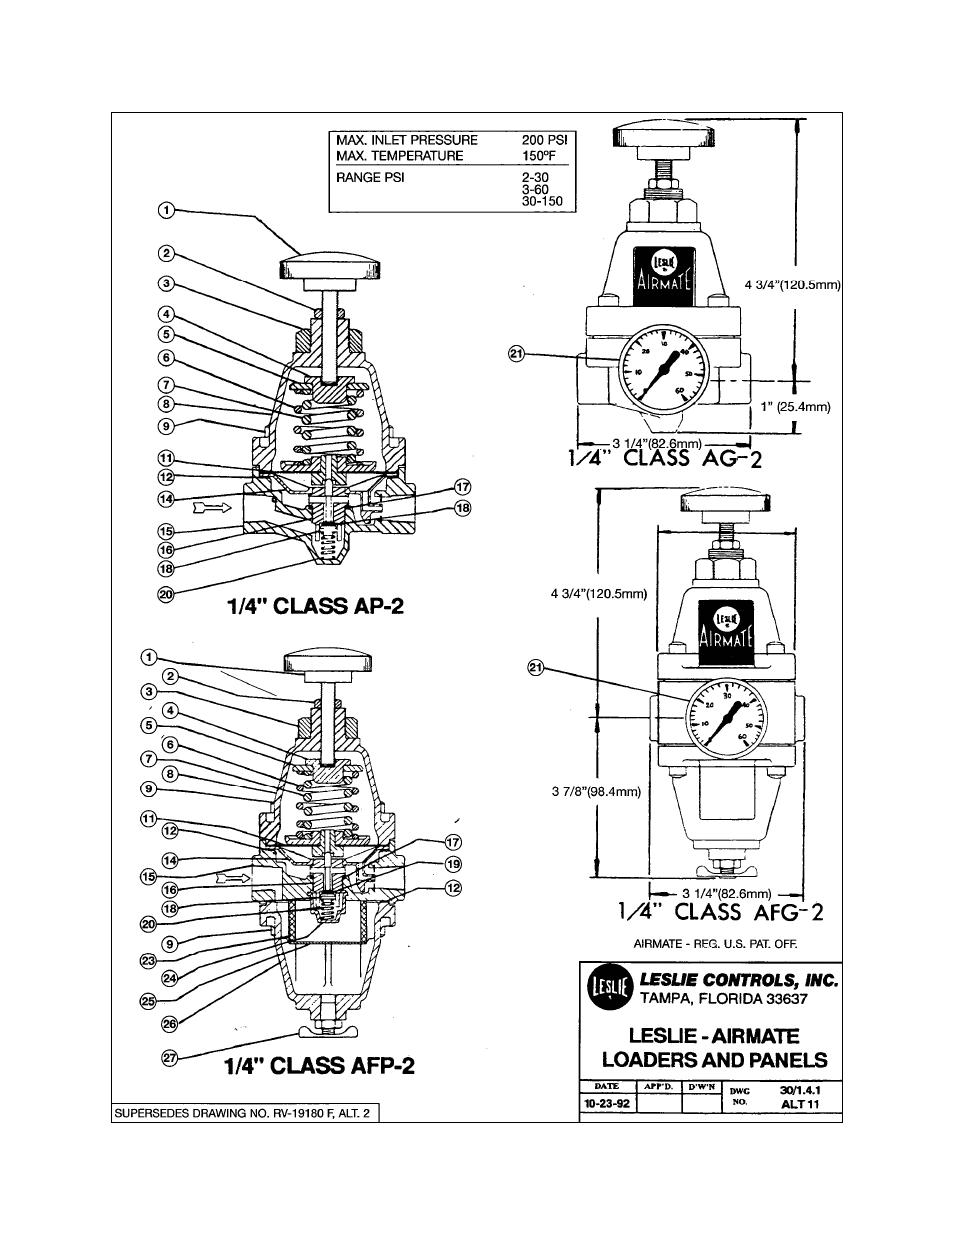 Leslie Controls AFG-2, etc small flow airmate pressure